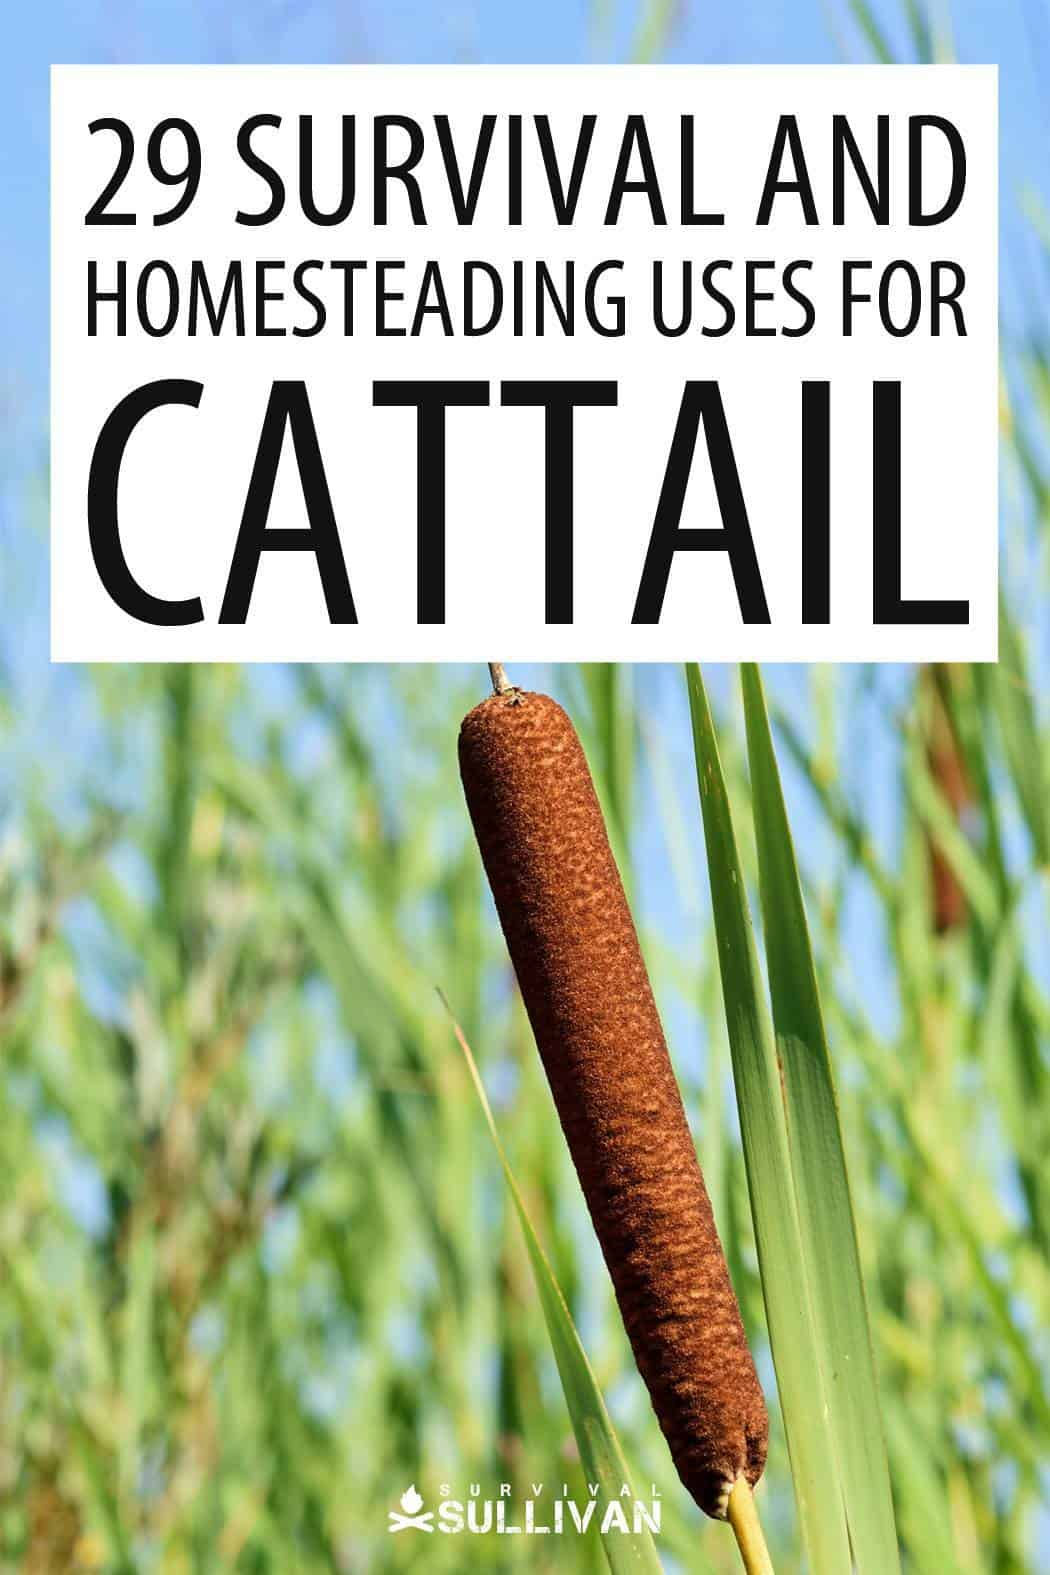 cattail Pinterest image